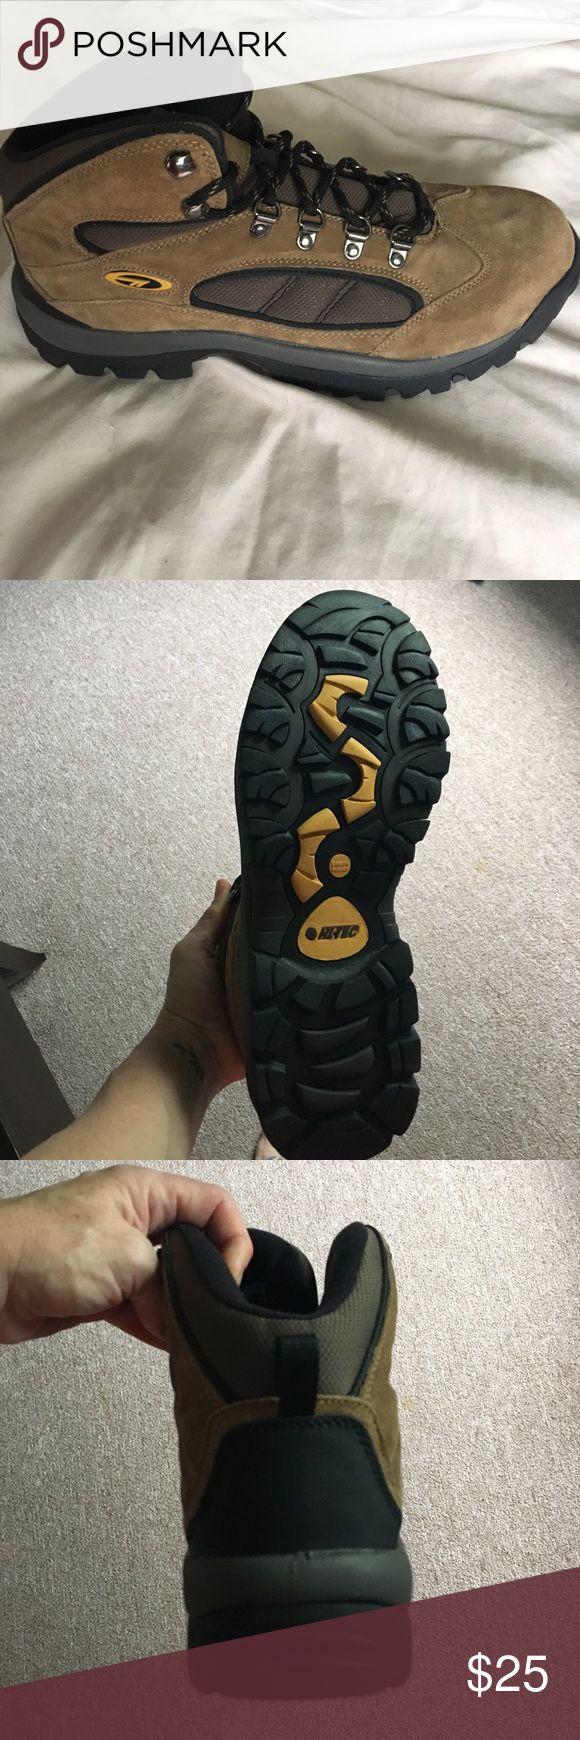 NIB Hiking boots Hi-Tec Outdoor Hiking Boots Shoes Boots